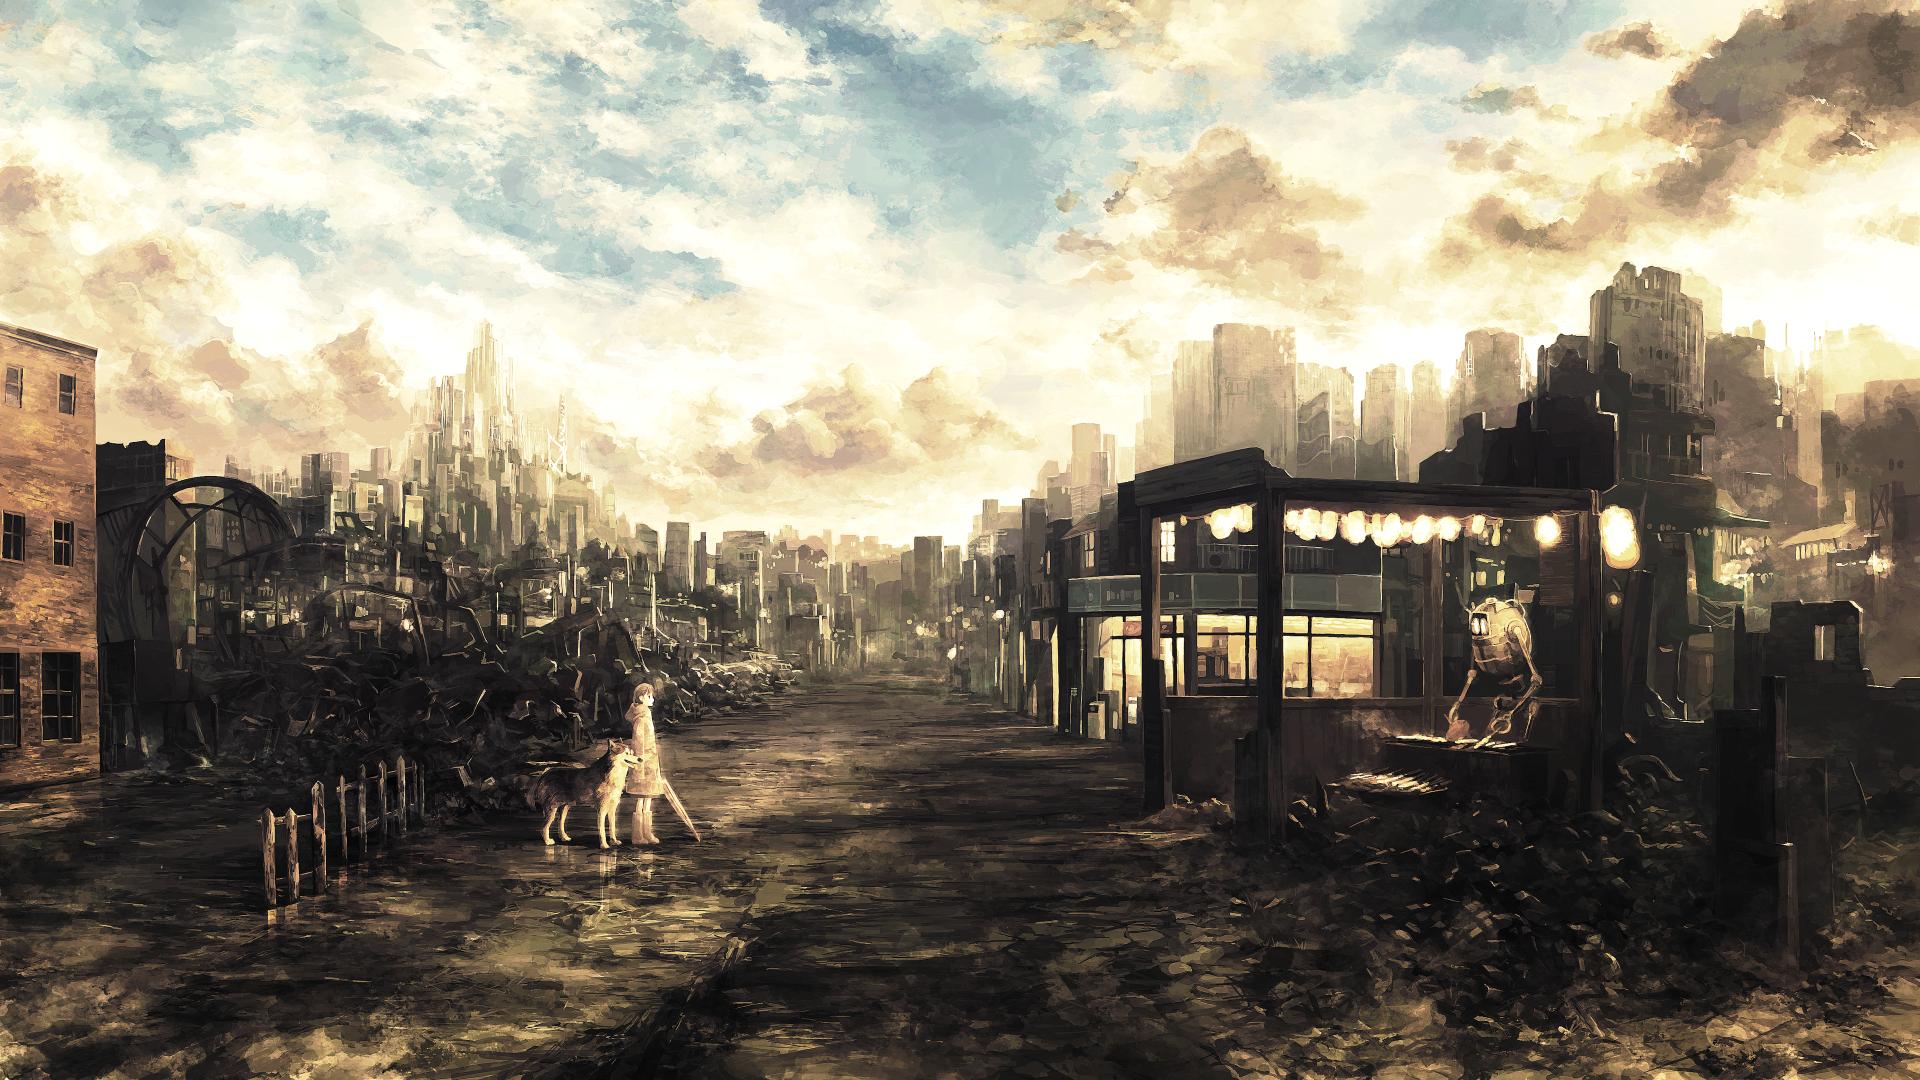 General 1920x1080 city ruin fantasy art wasteland